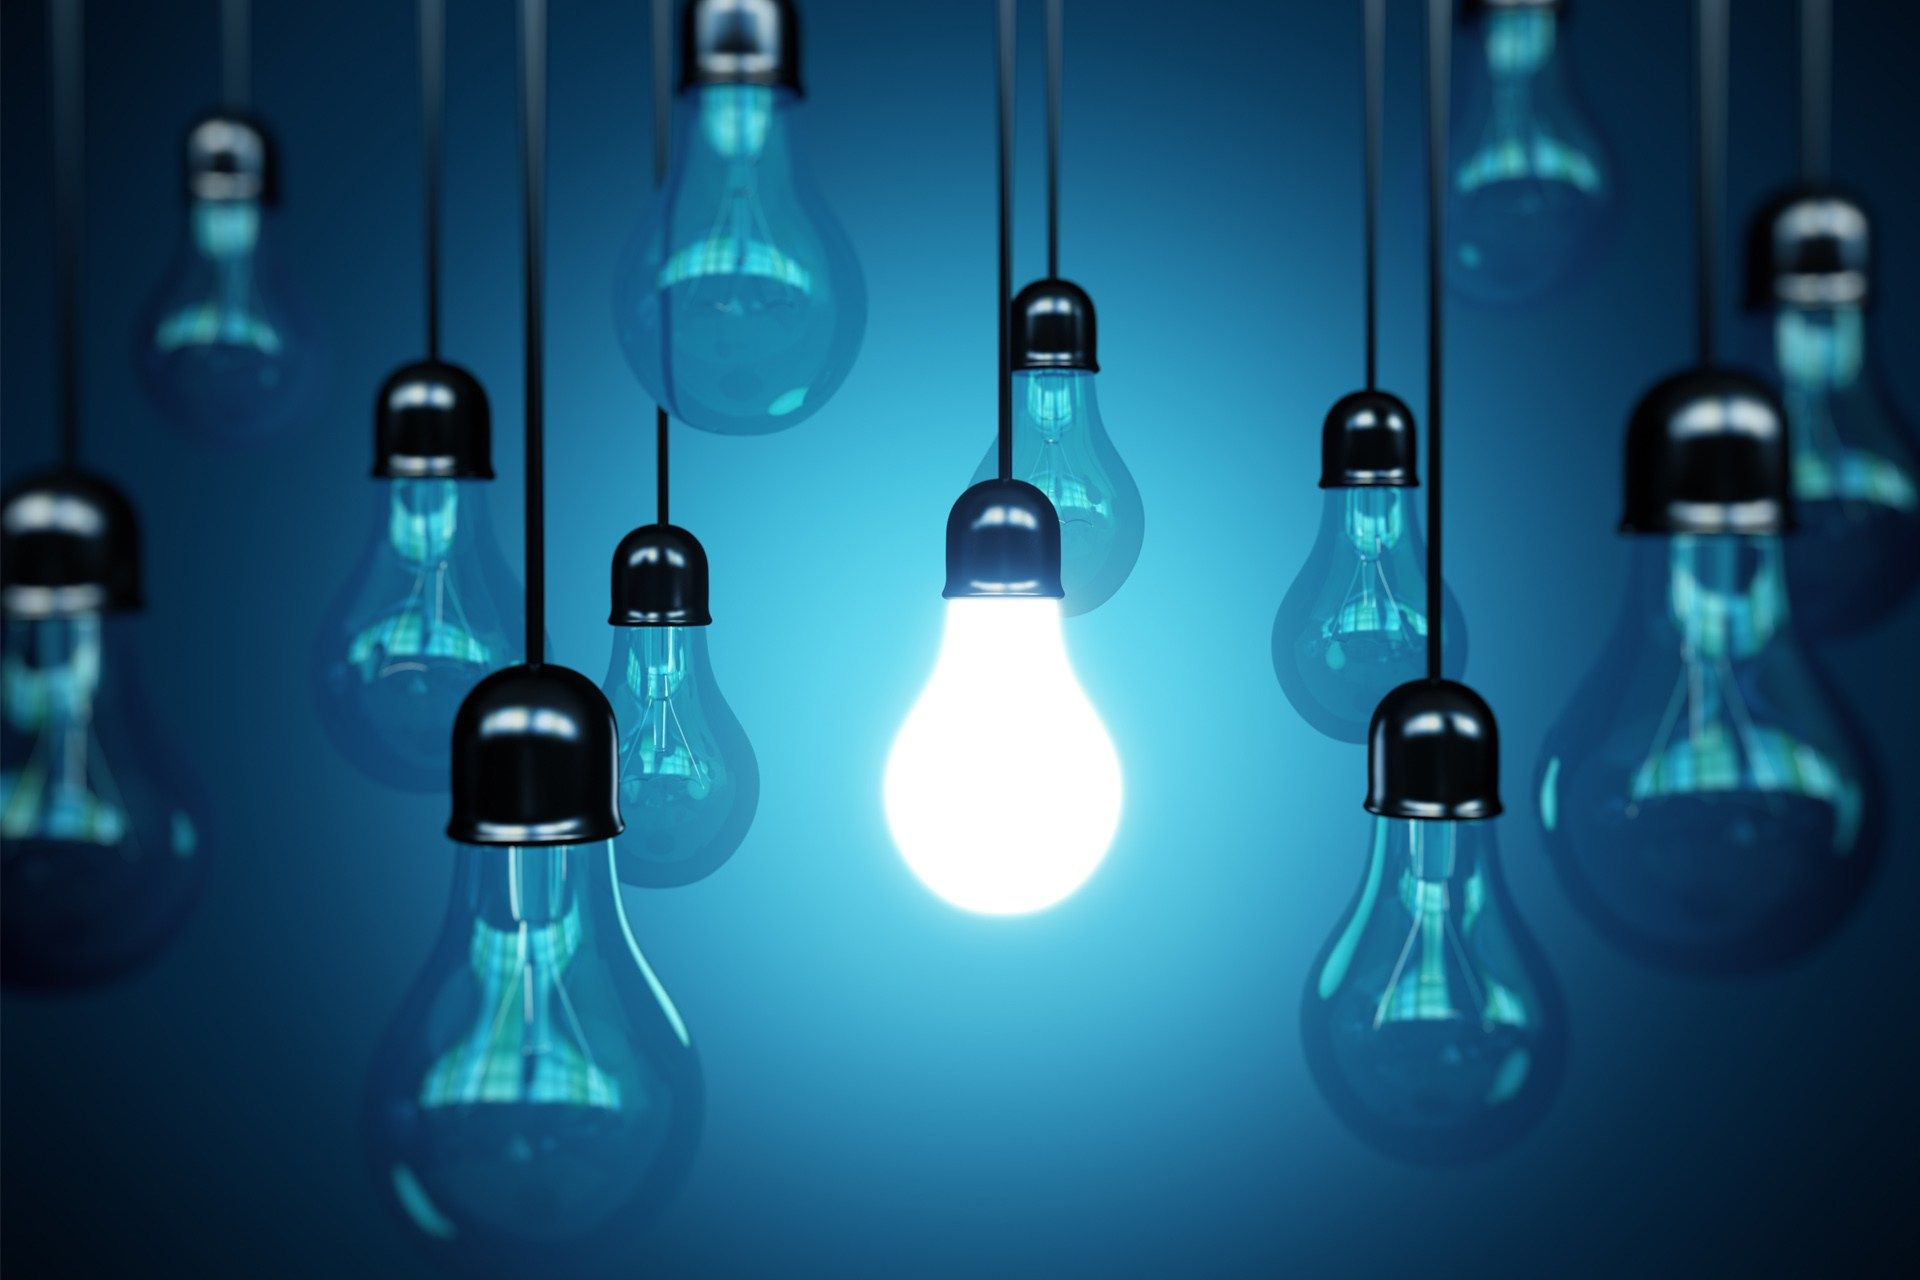 Light Bulbs || Image URL: http://cdni.wired.co.uk/1920x1280/k_n/lifi ...